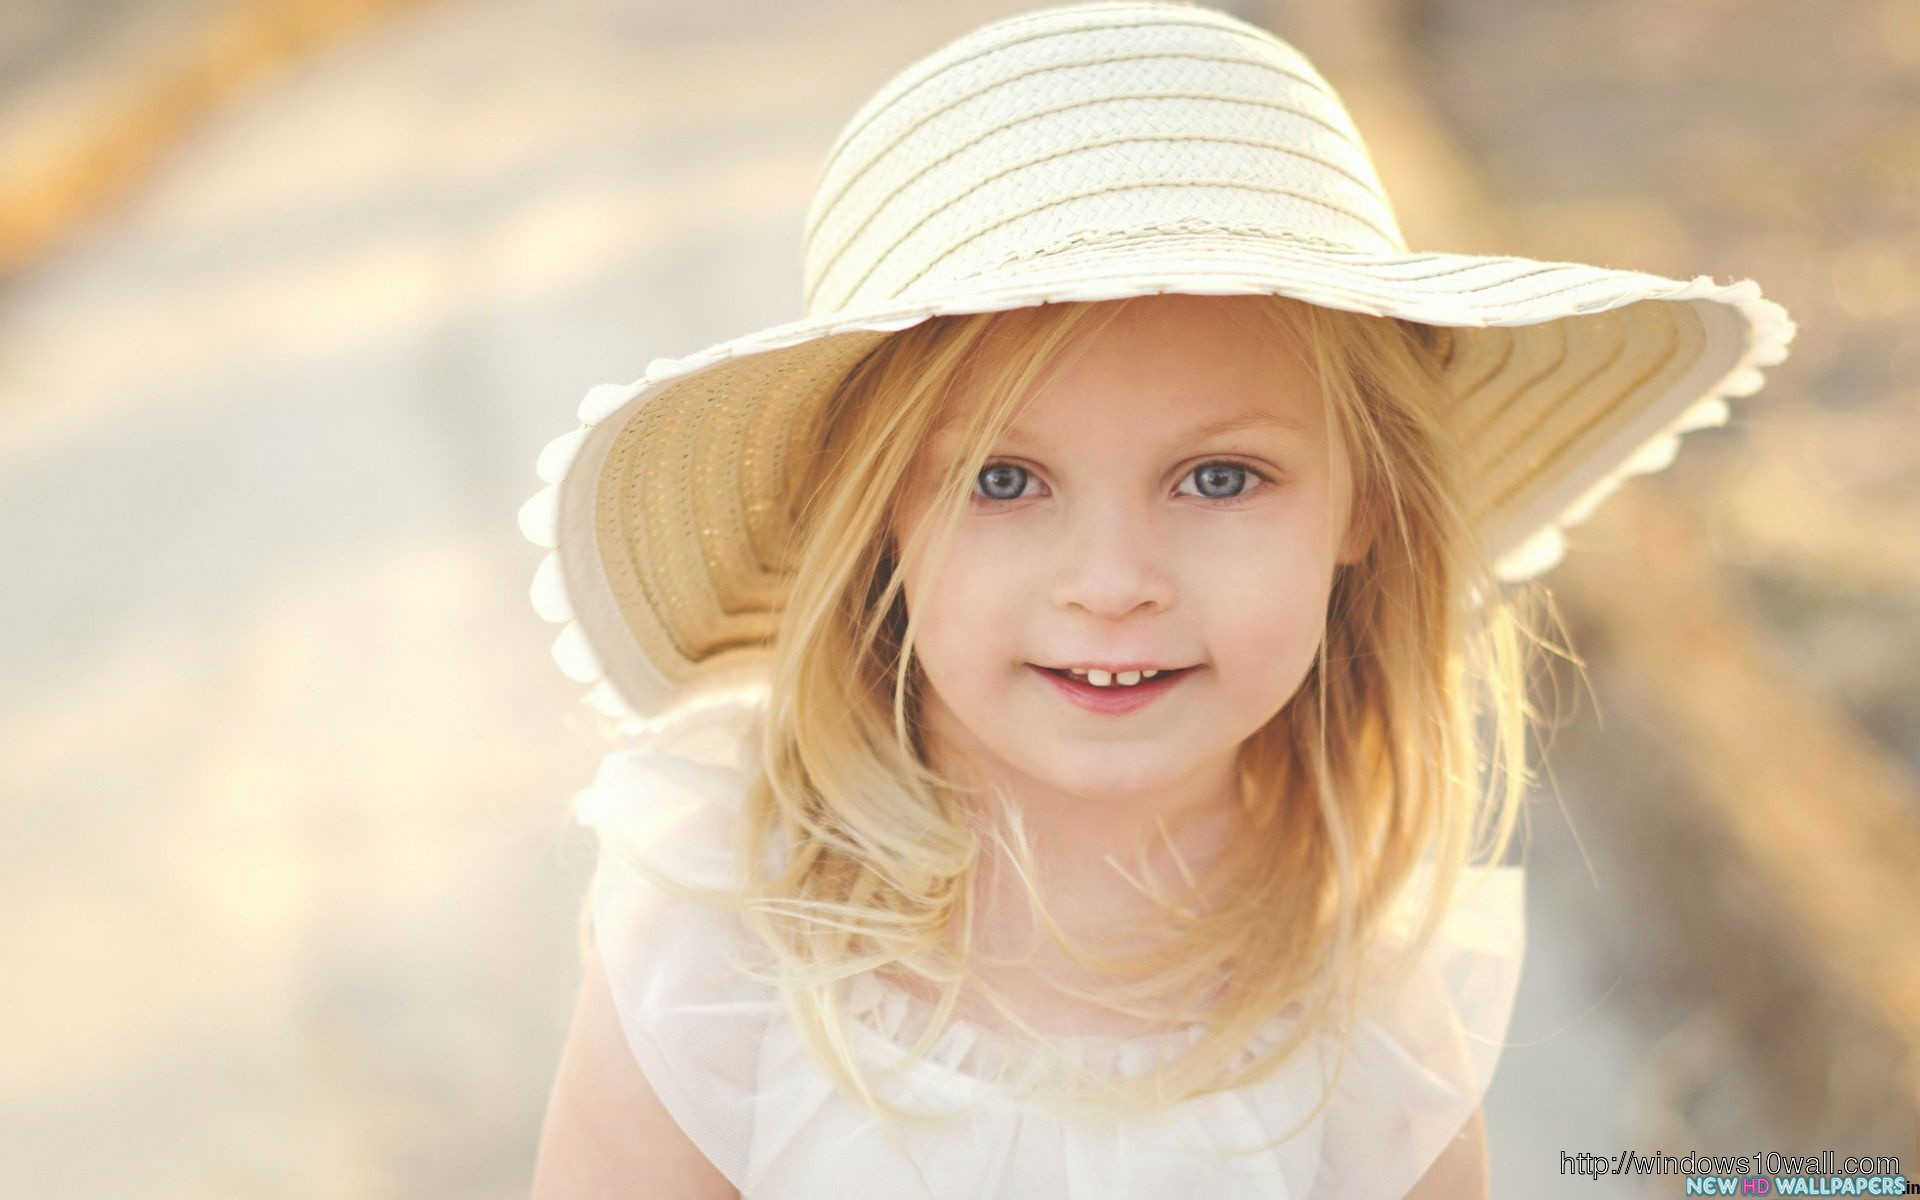 Cute Girl Hat Background Wallpaper